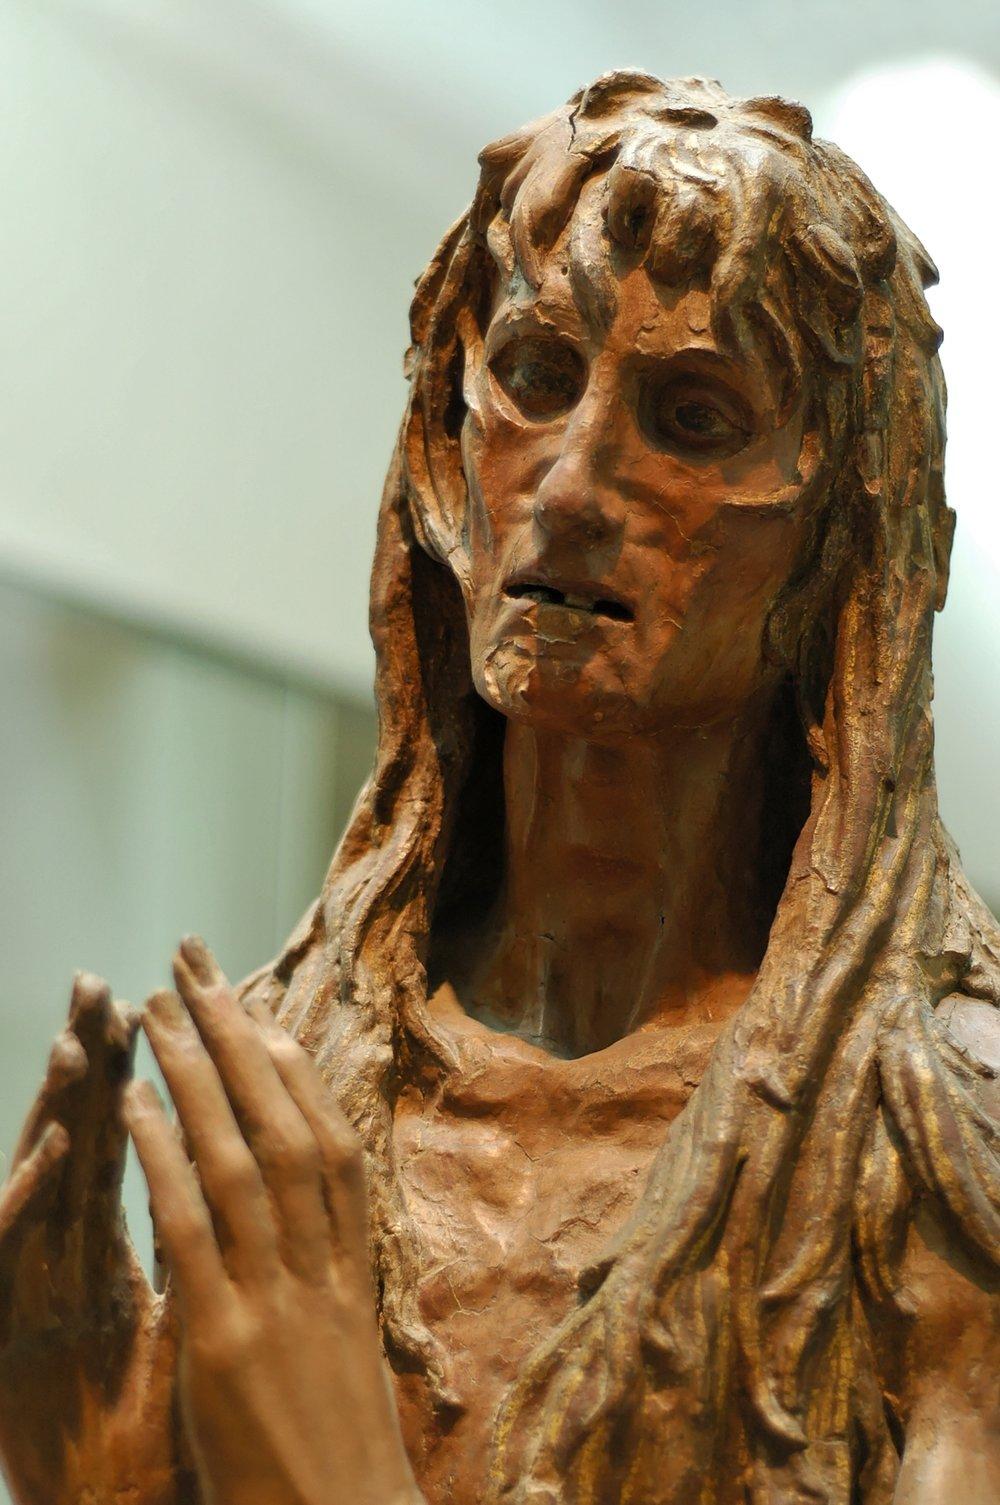 Mary Magdalene, by Donatello (Italian, 1386–1466) (Jastrow, own picture) [Public domain], via Wikimedia Commons